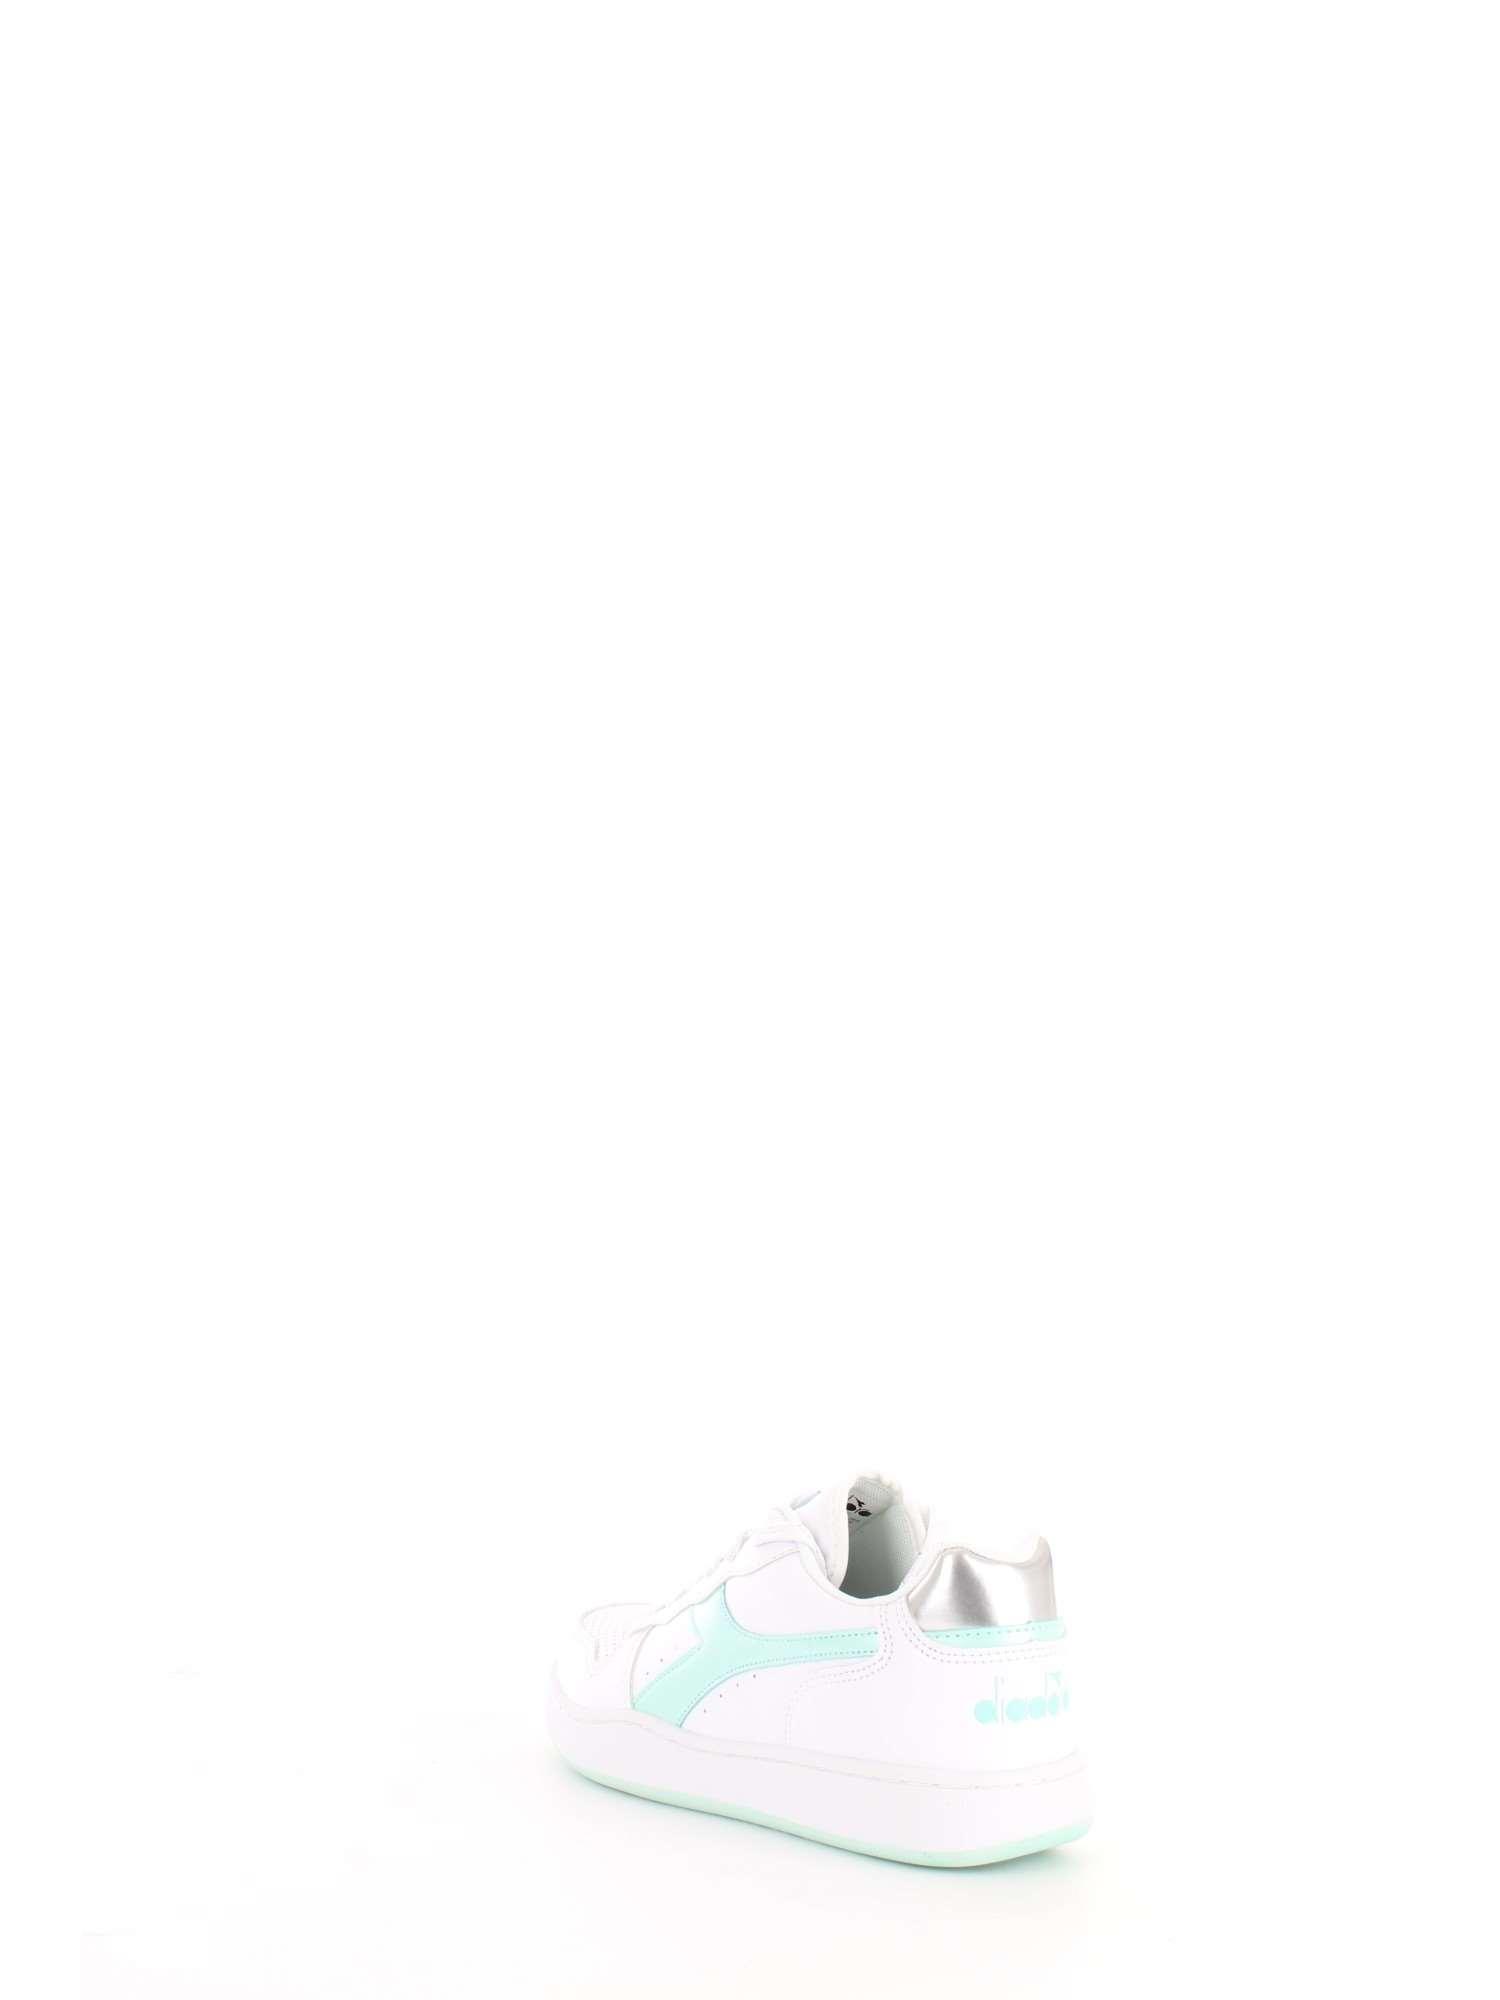 Primavera Bianco estate Sneakers Verde Donna 65141 173123 Diadora 5gqYOY